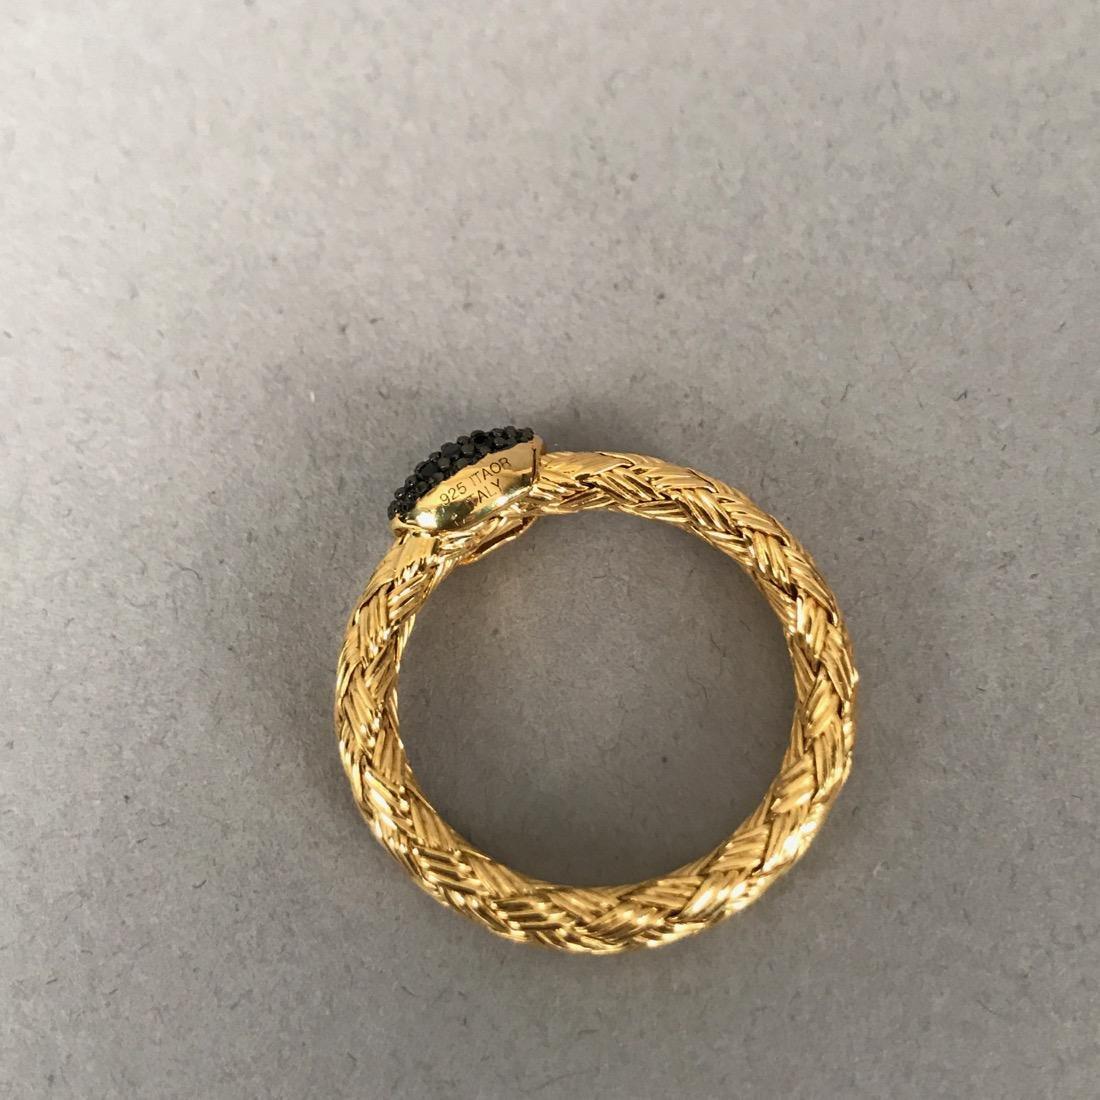 7 Sterling Silver Rings - 4